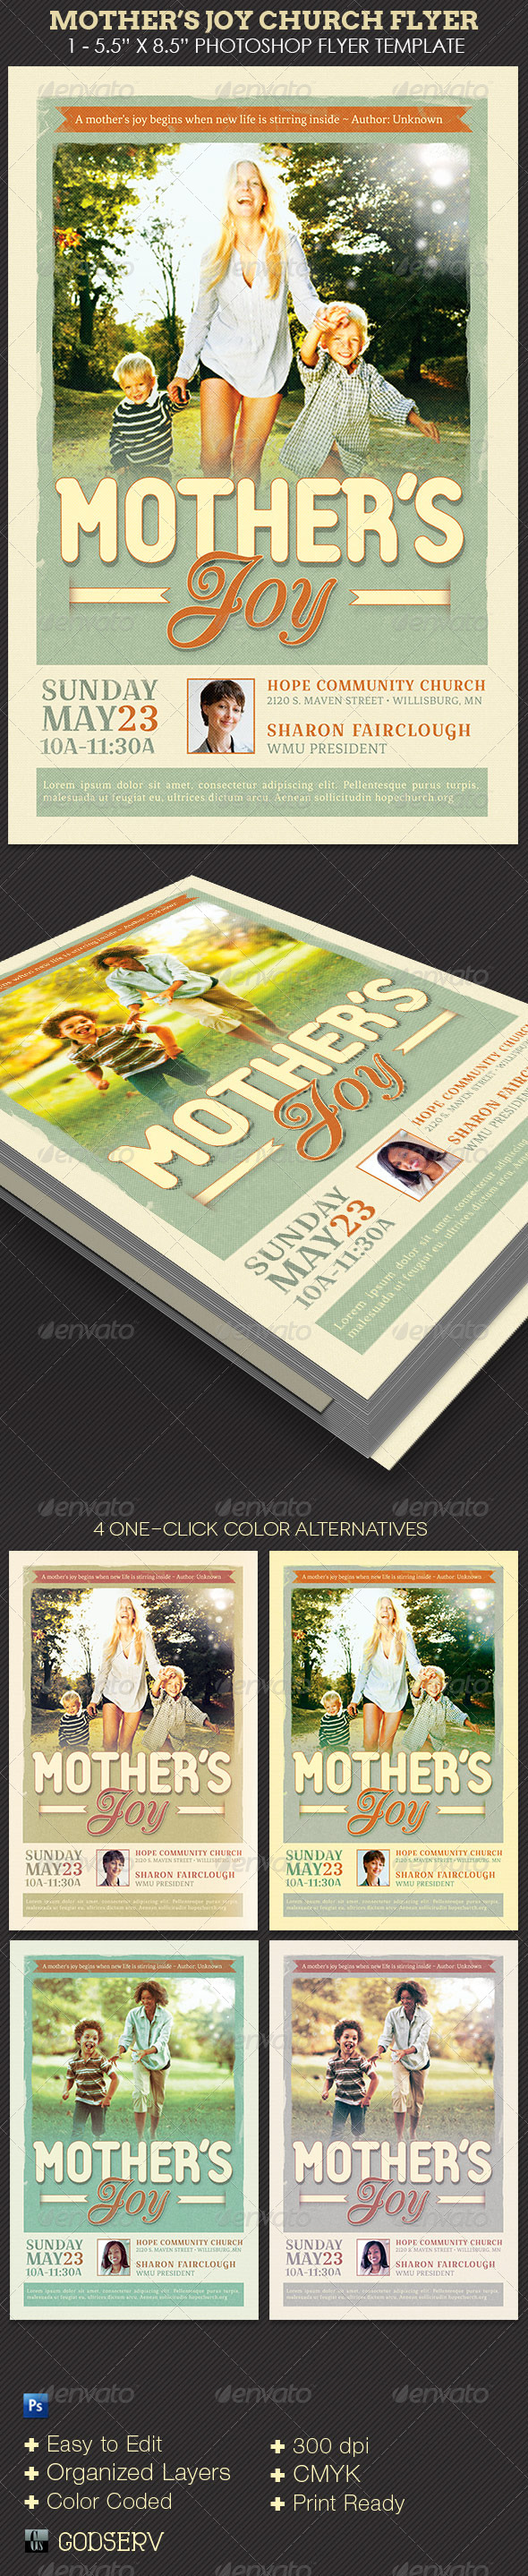 Mothers Joy Church Flyer Template - Church Flyers